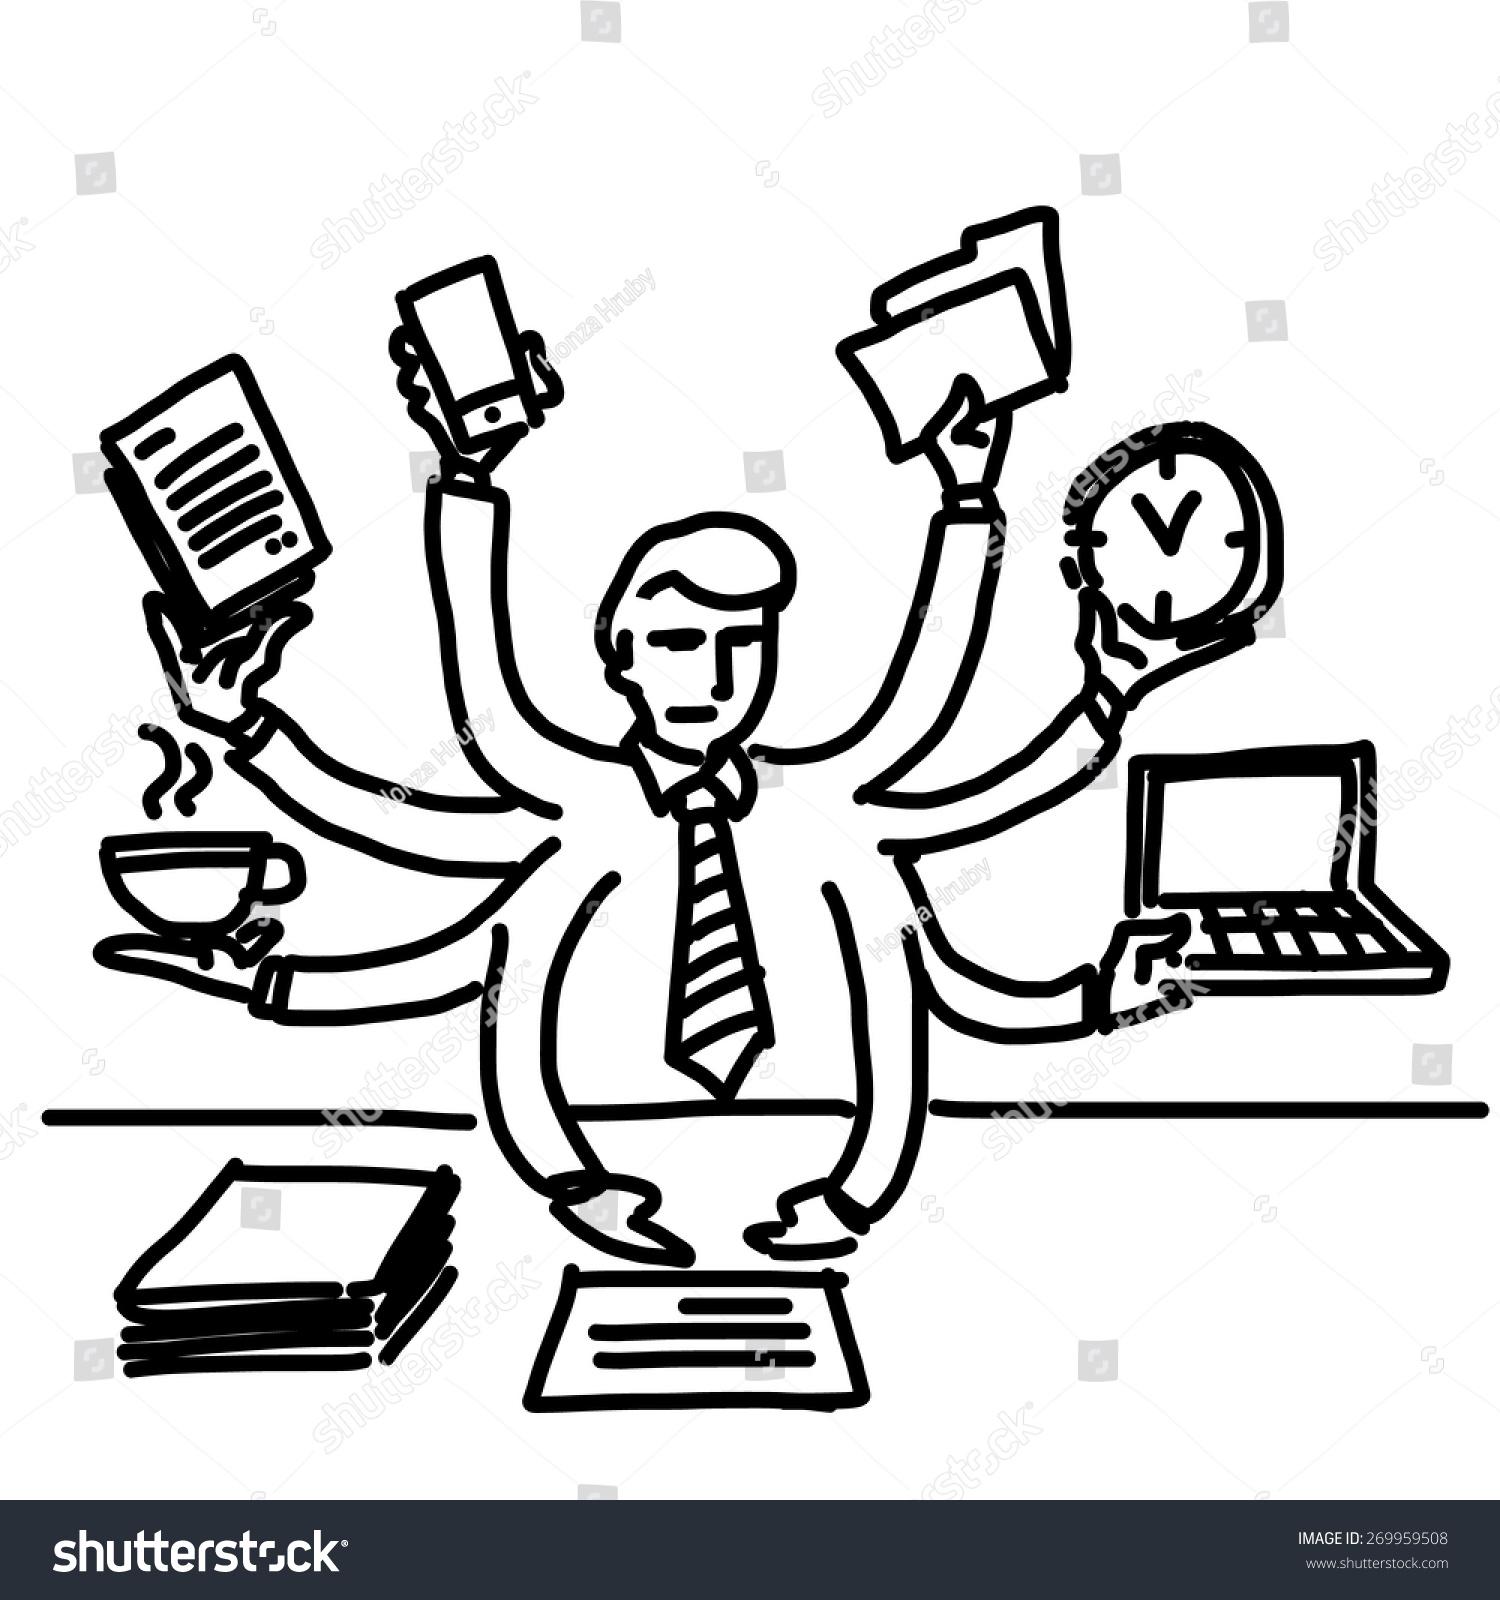 Vector Illustration Businessman Workaholic Multitasking Simply Stock.